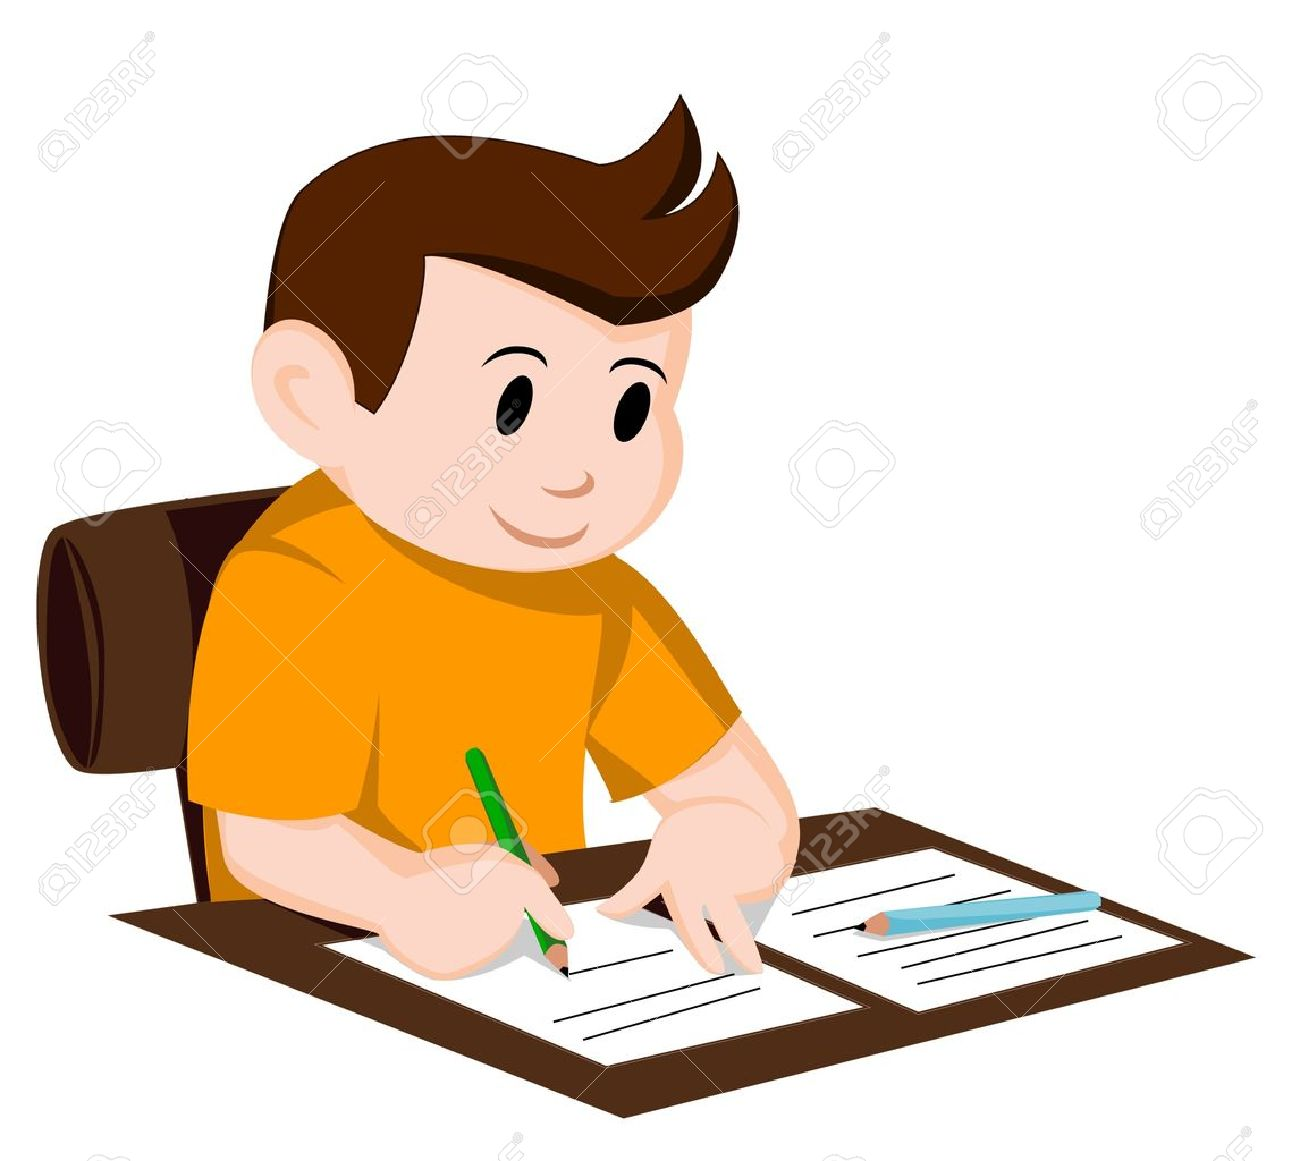 Online homework help in the best service